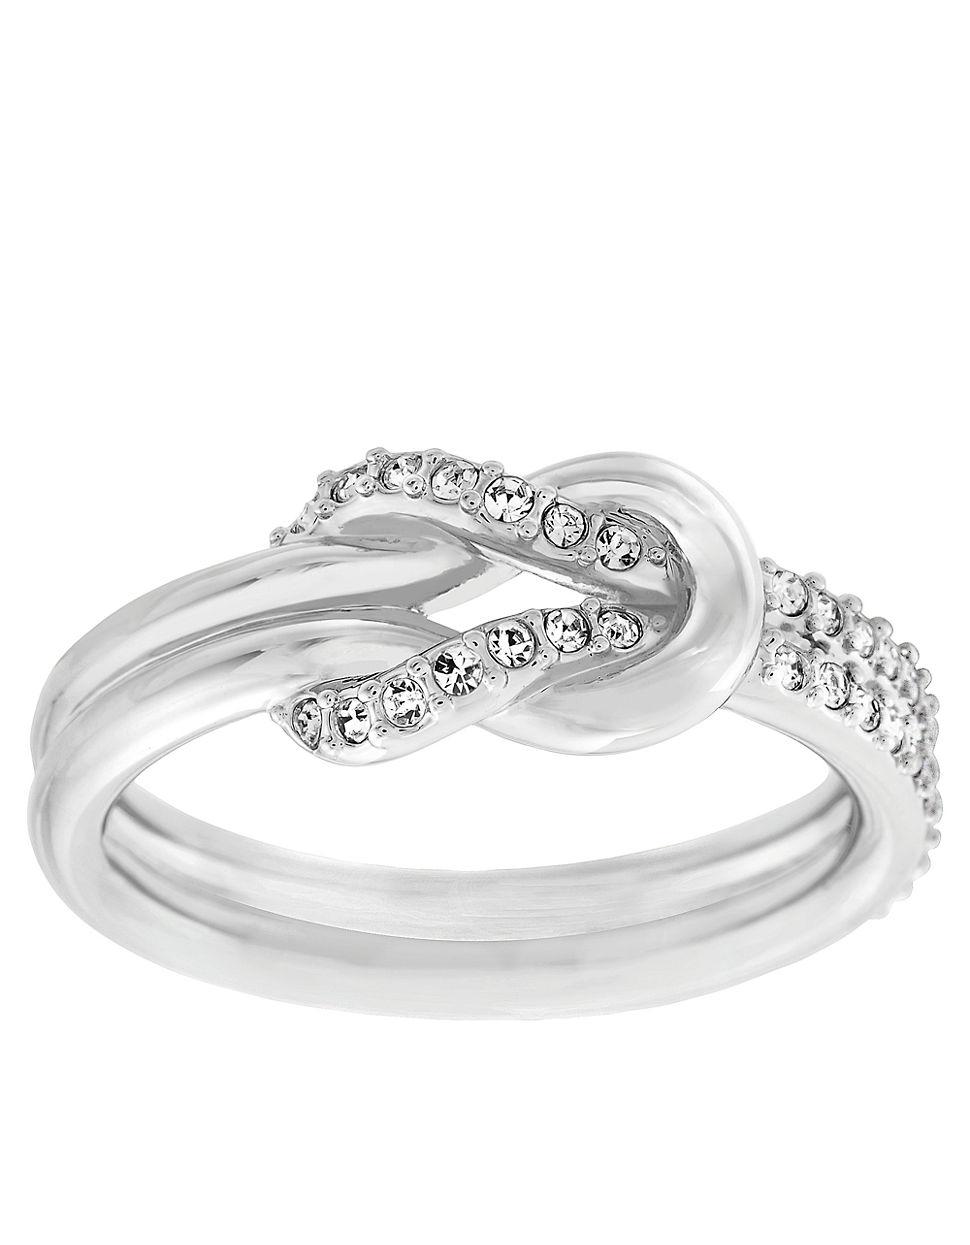 db8c314bf6128 Swarovski Metallic Voile Silvertone And Crystal Knot Ring